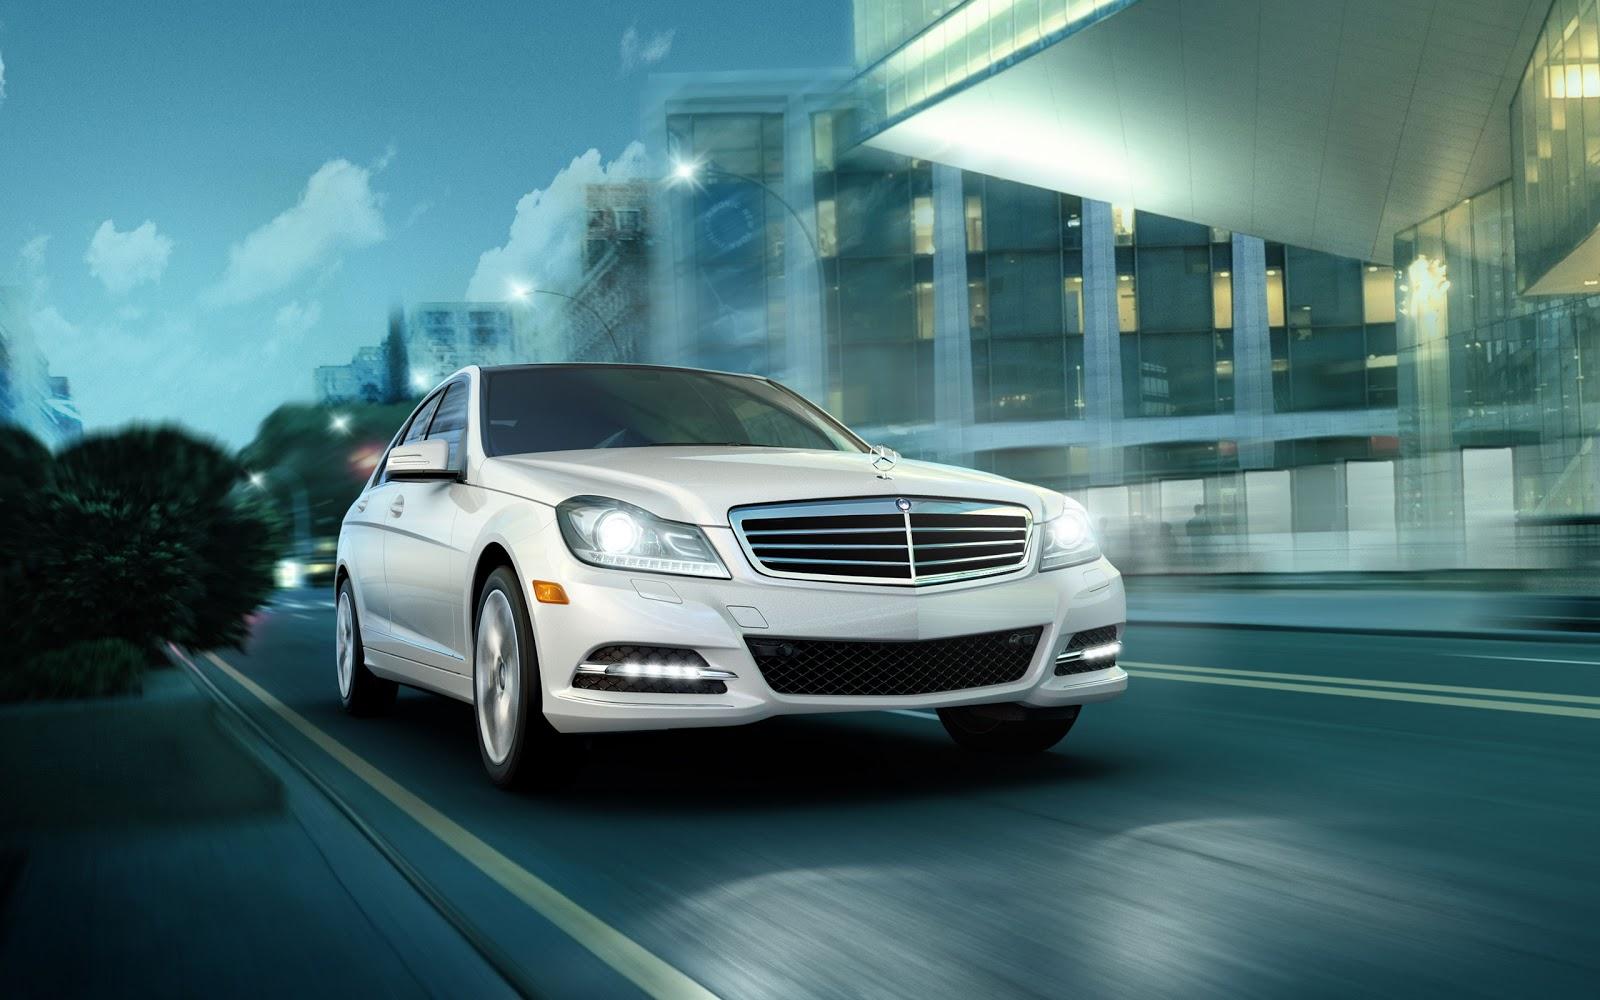 http://4.bp.blogspot.com/-PeXUX3jGCz4/ULrTUbwiqnI/AAAAAAAALXw/Kr2Xf_1Ot98/s1600/Mercedes+Benz-2013-C-Class-Sedan-exterior-front-side-view-white.jpg